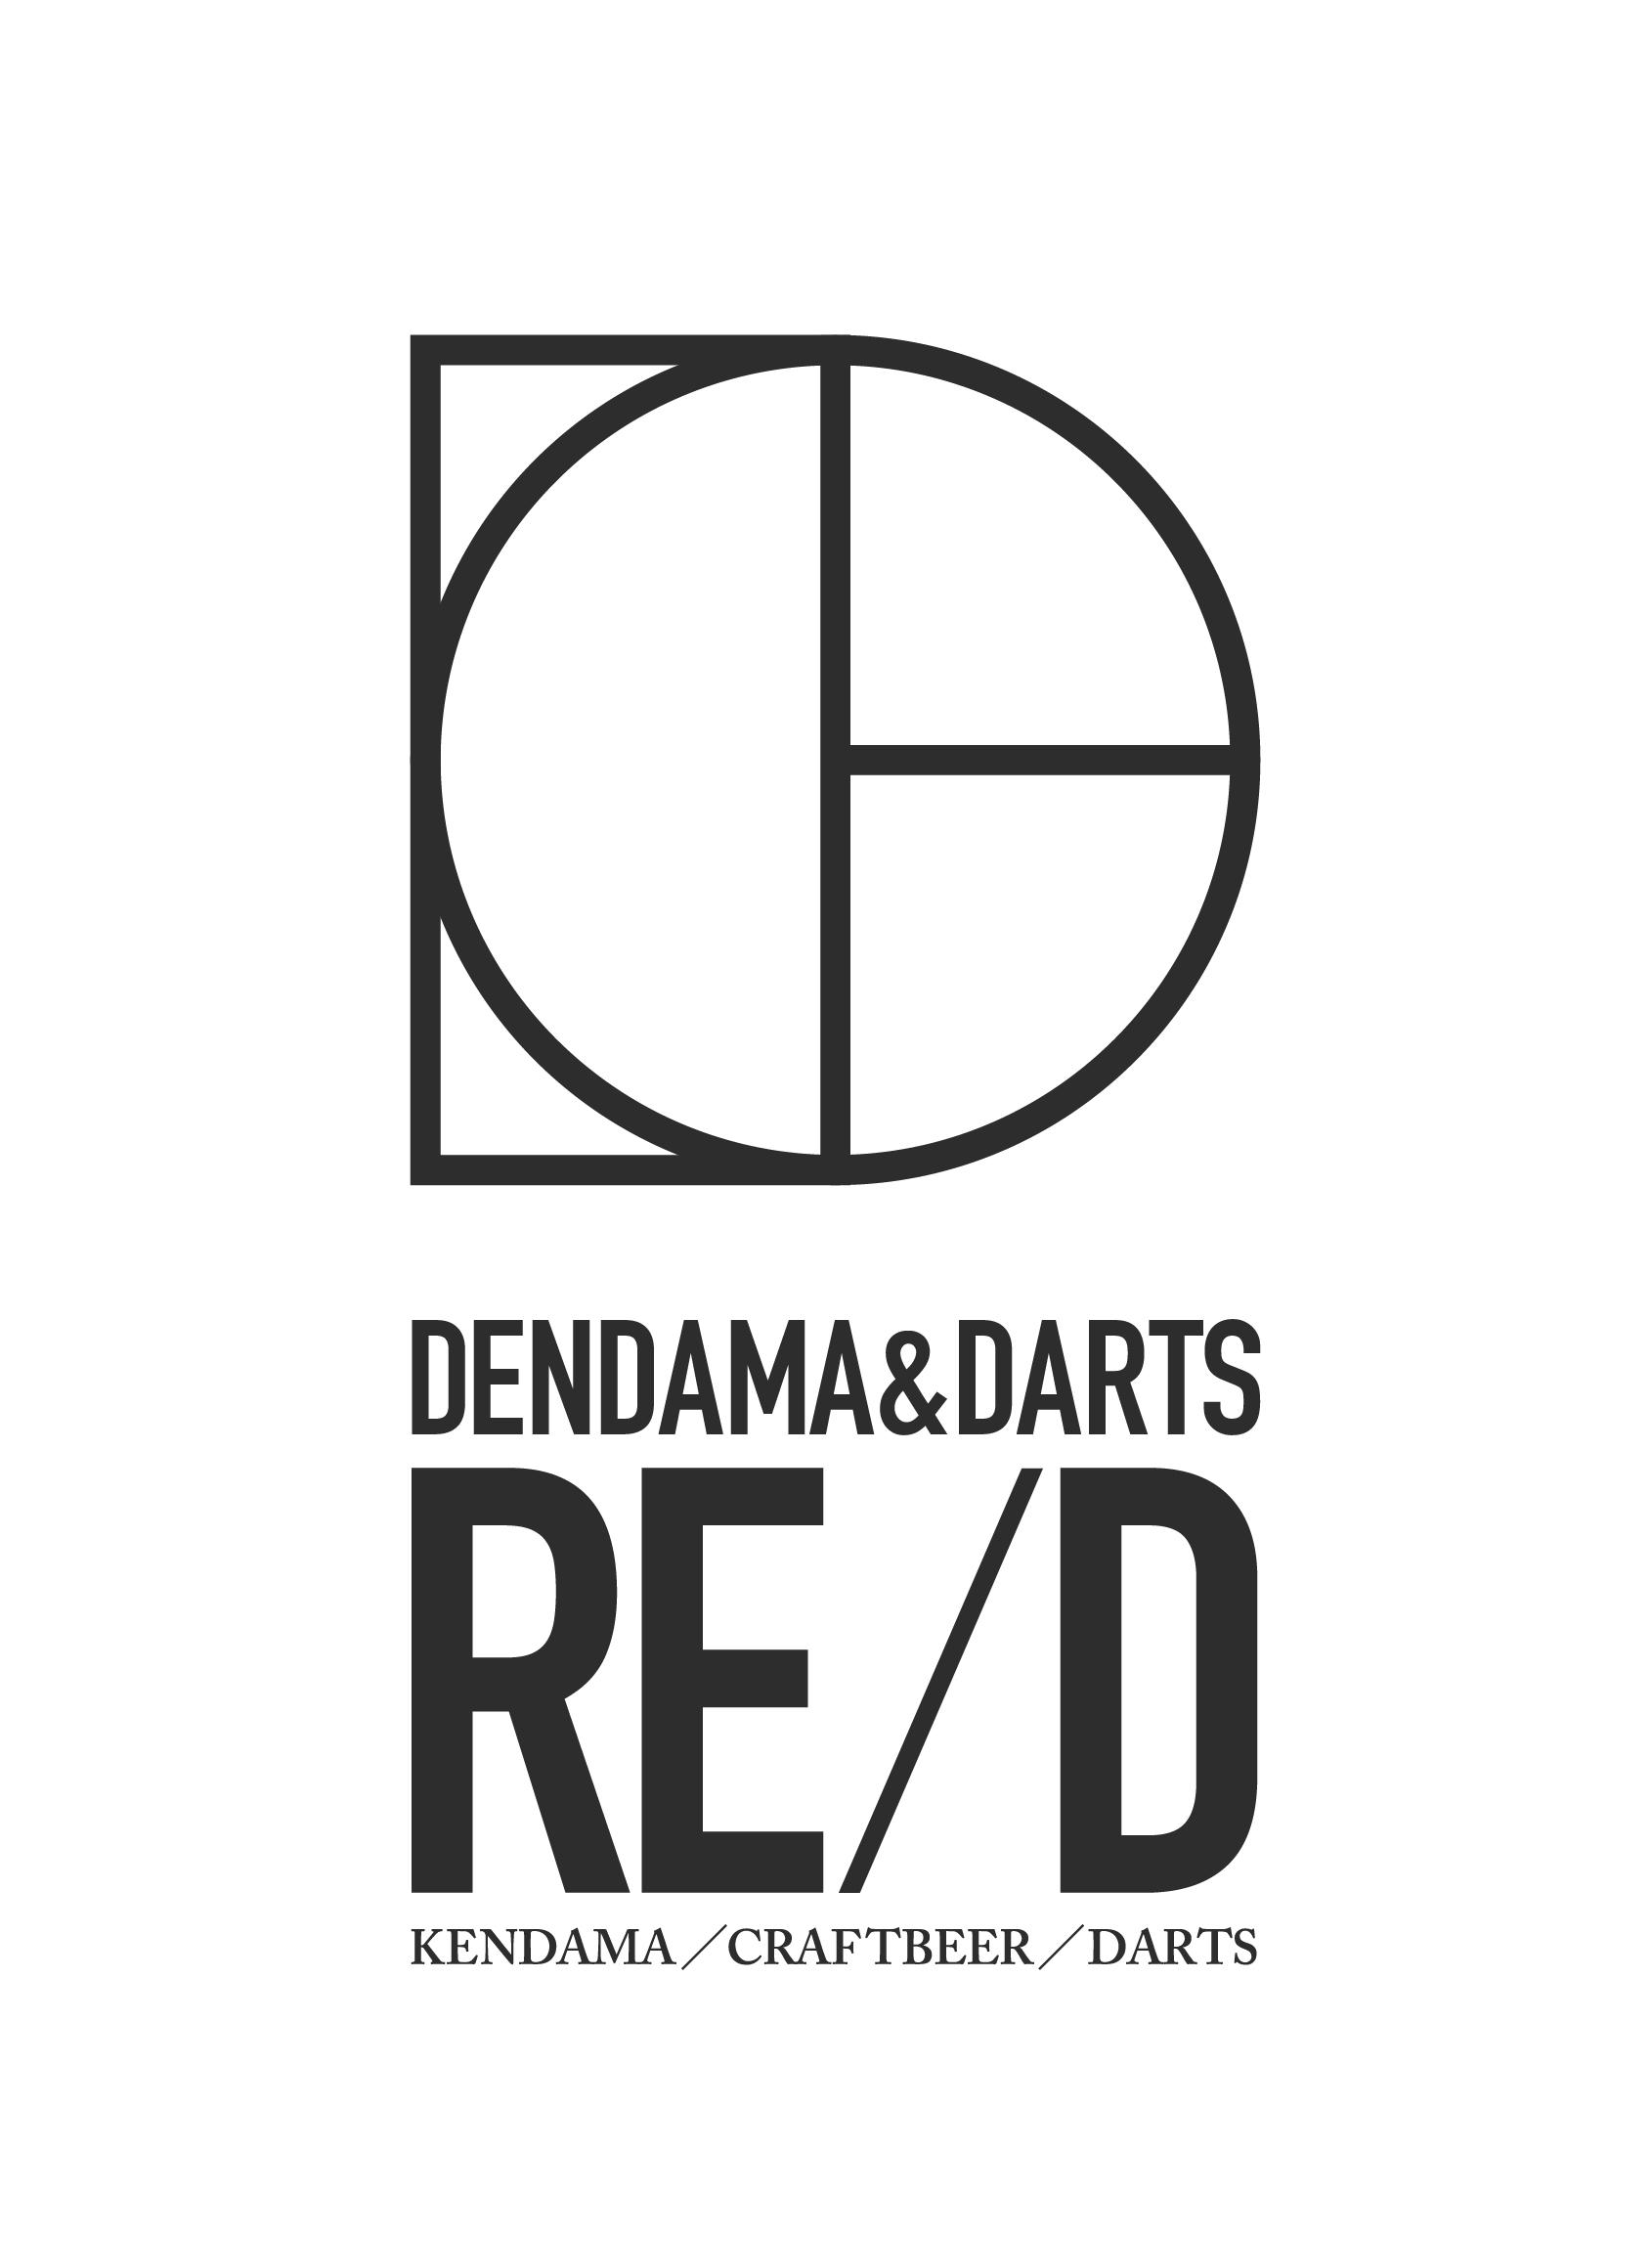 DENDAMA&DARTS RE/D